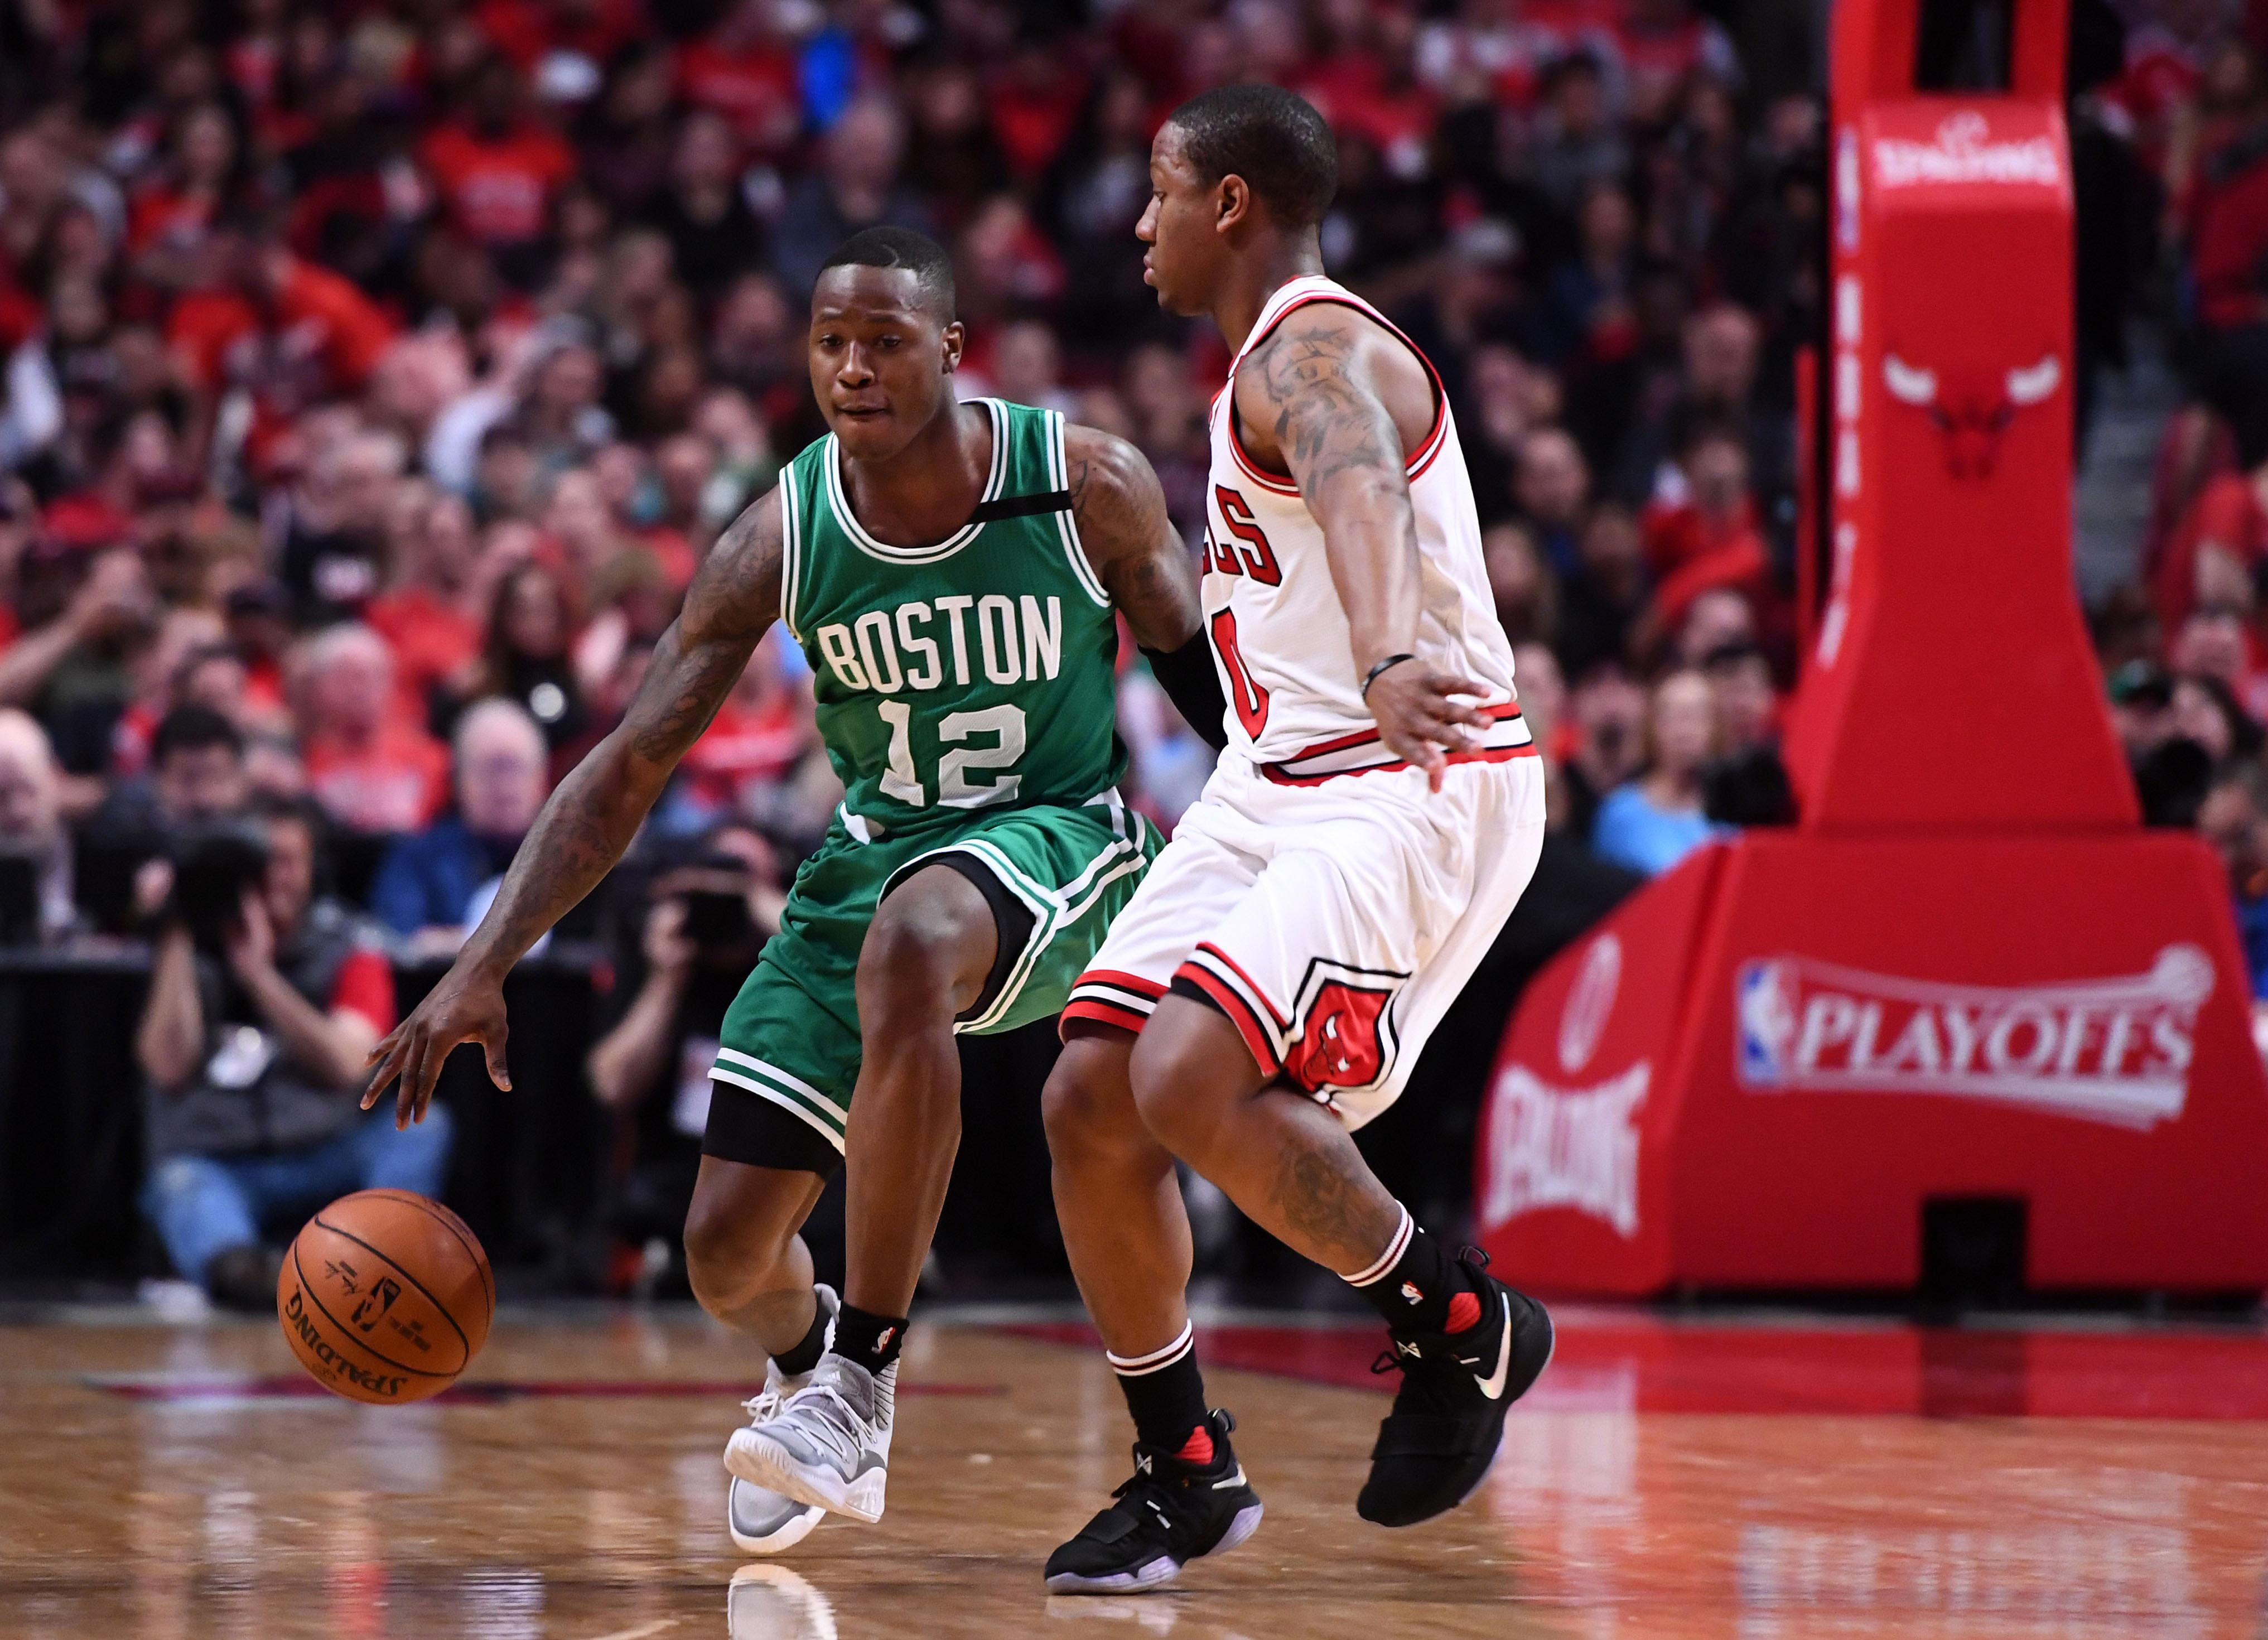 10028316-nba-playoffs-boston-celtics-at-chicago-bulls